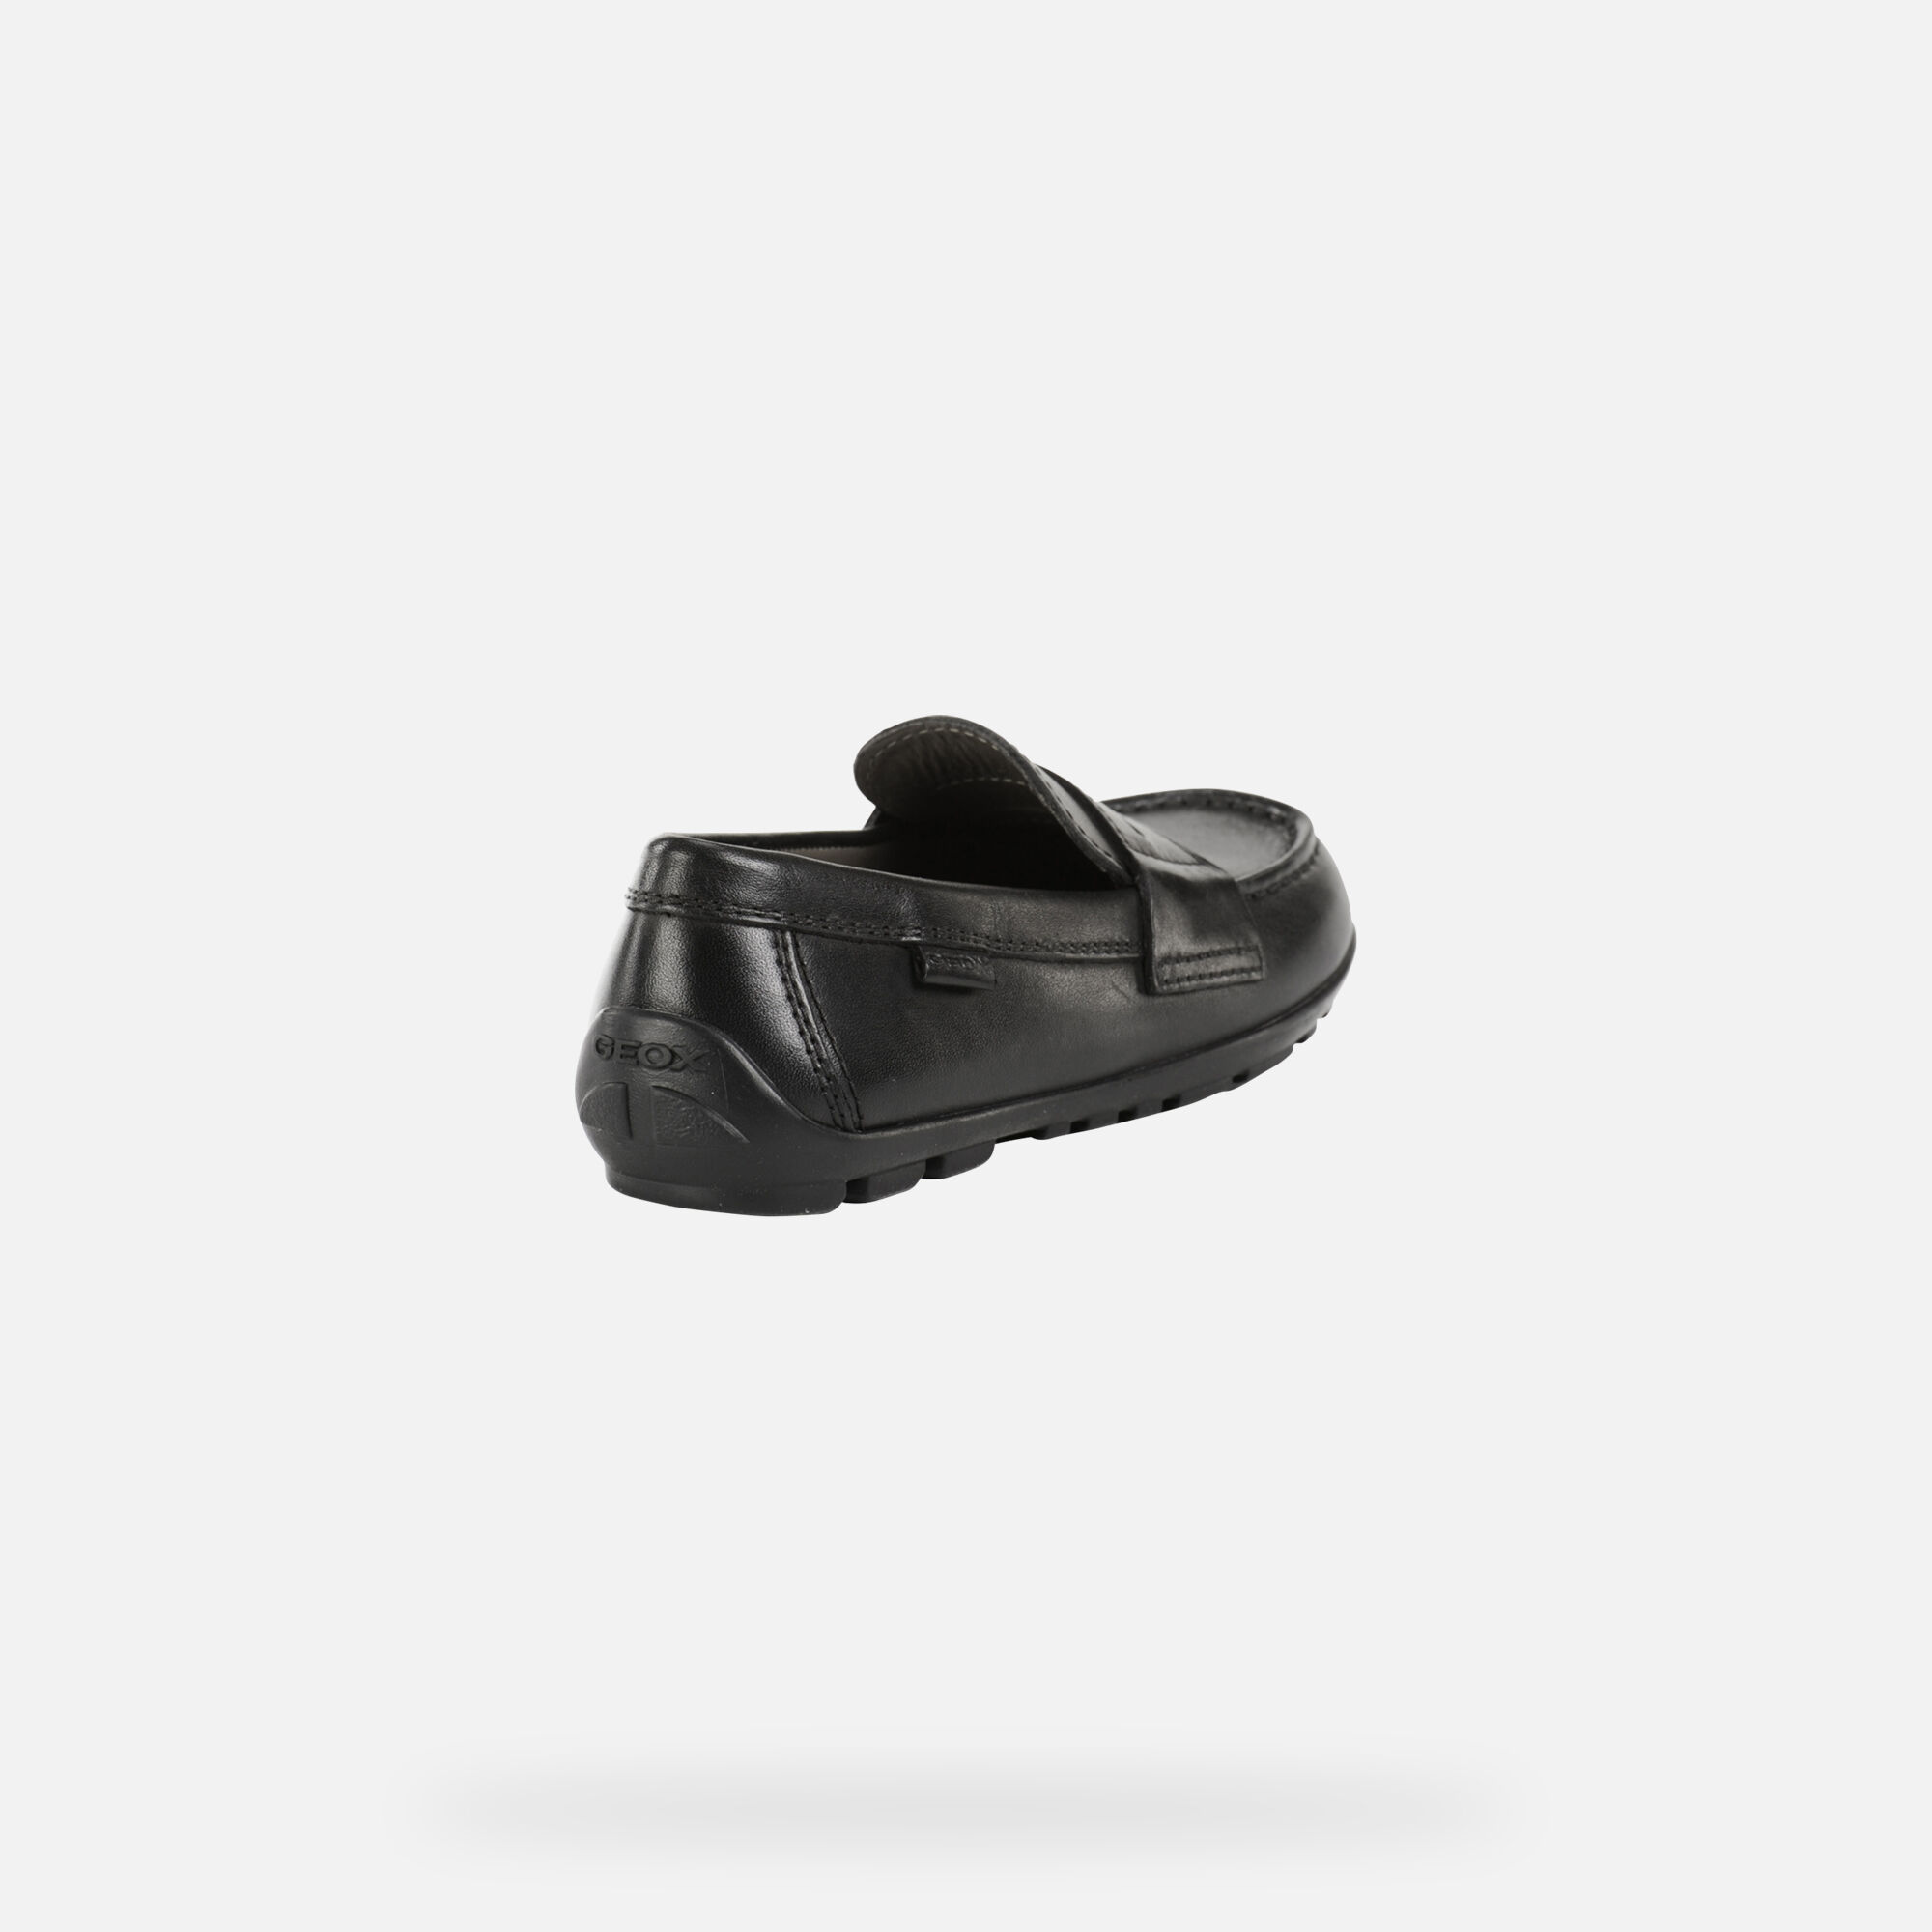 Geox Kids Jr Fast Loafers